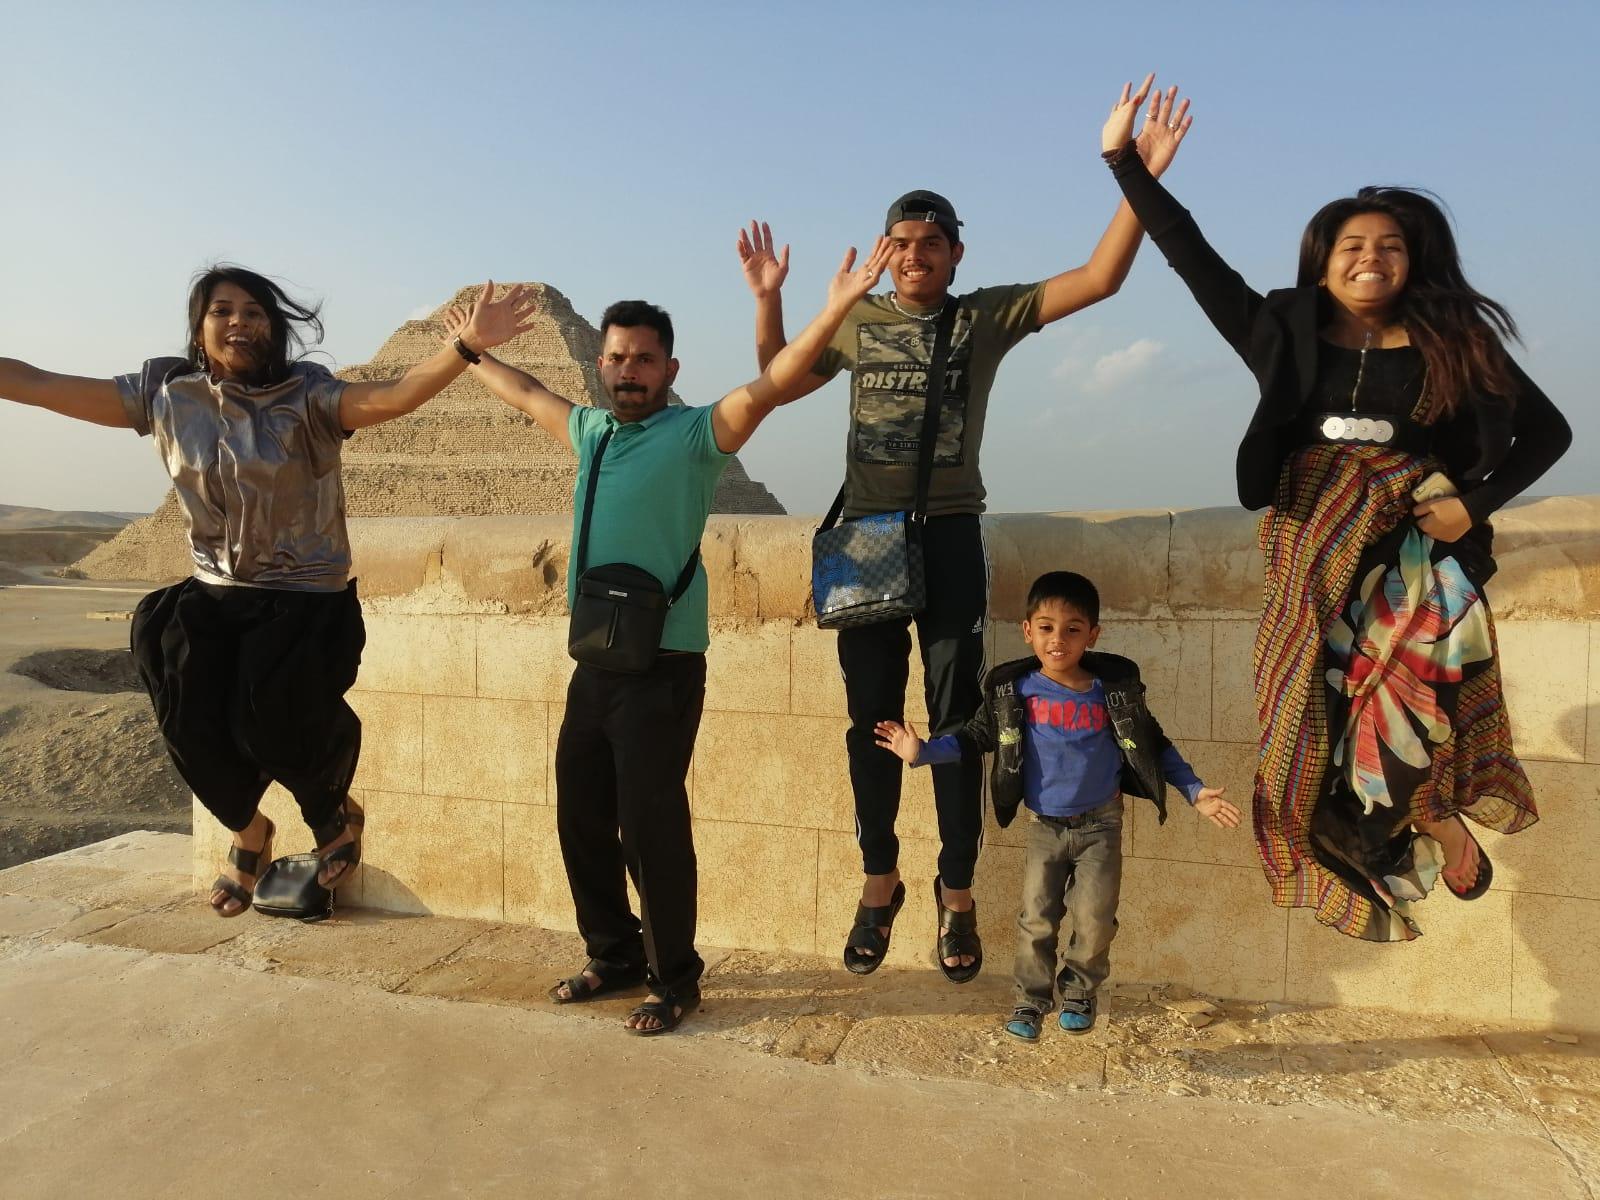 Egypt Nile Cruise Tour (Cairo, Luxor, Aswan, Abu Simbel) + Flights & Guide 3